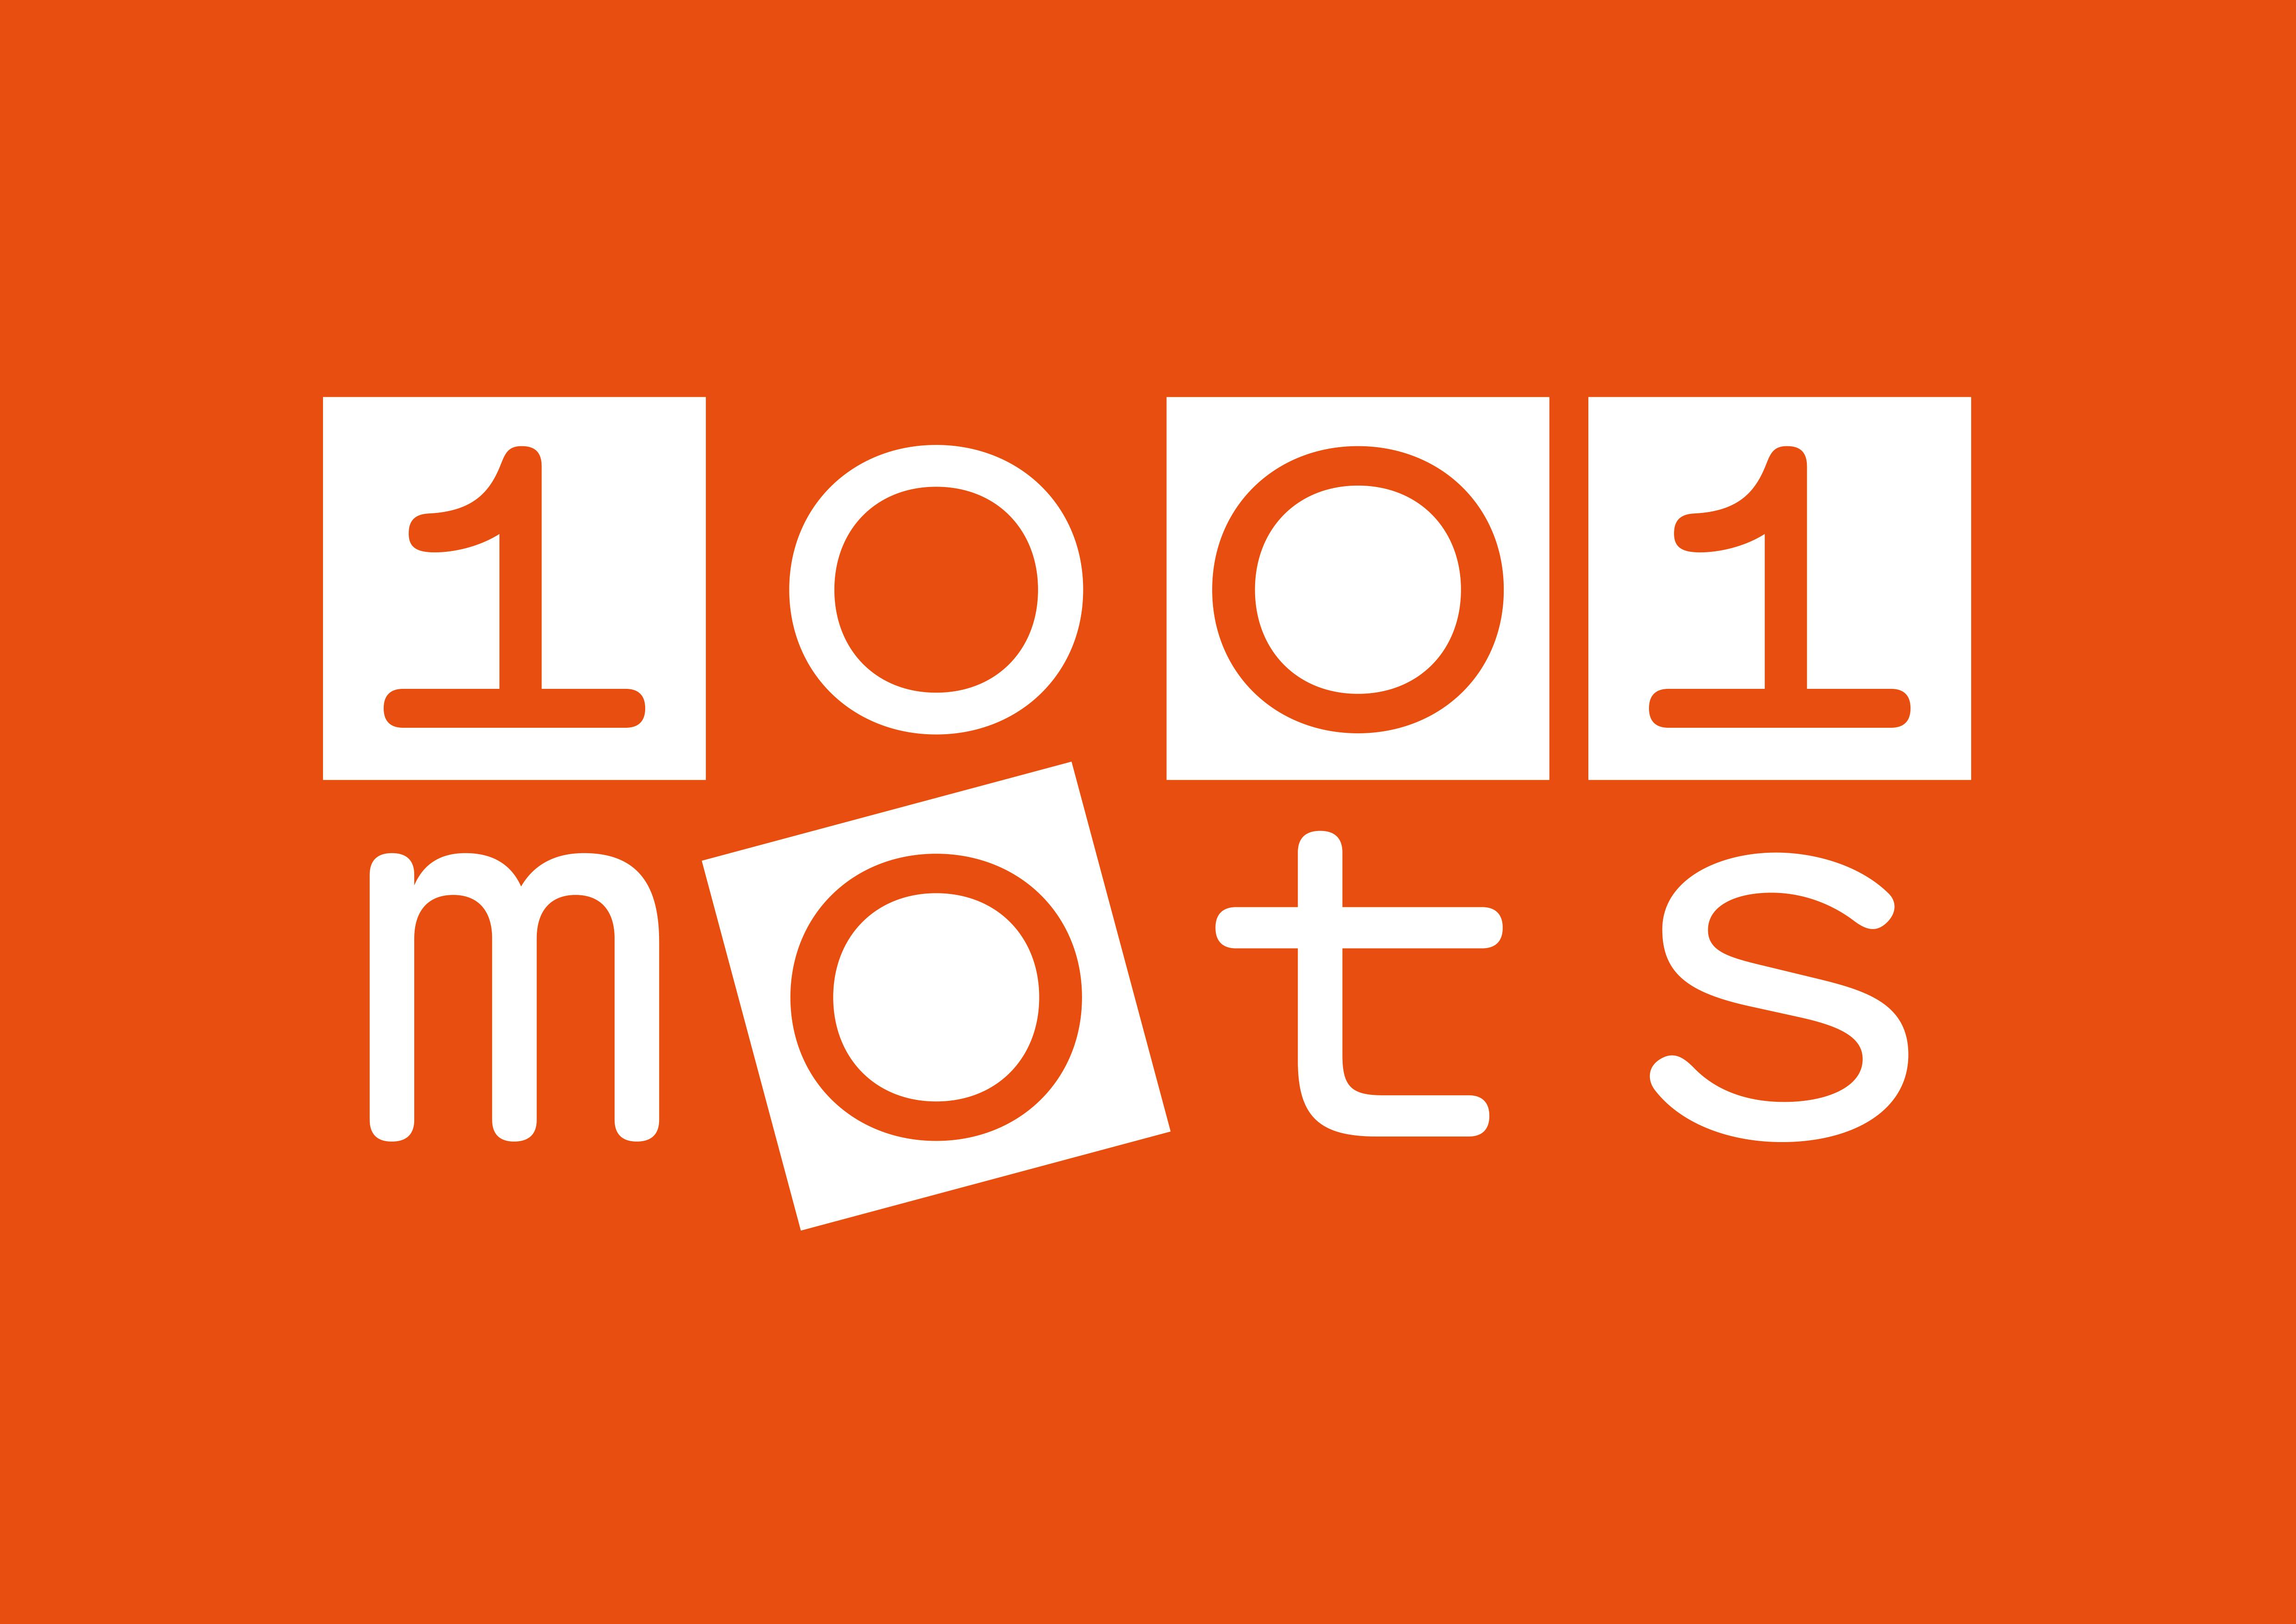 1001mots